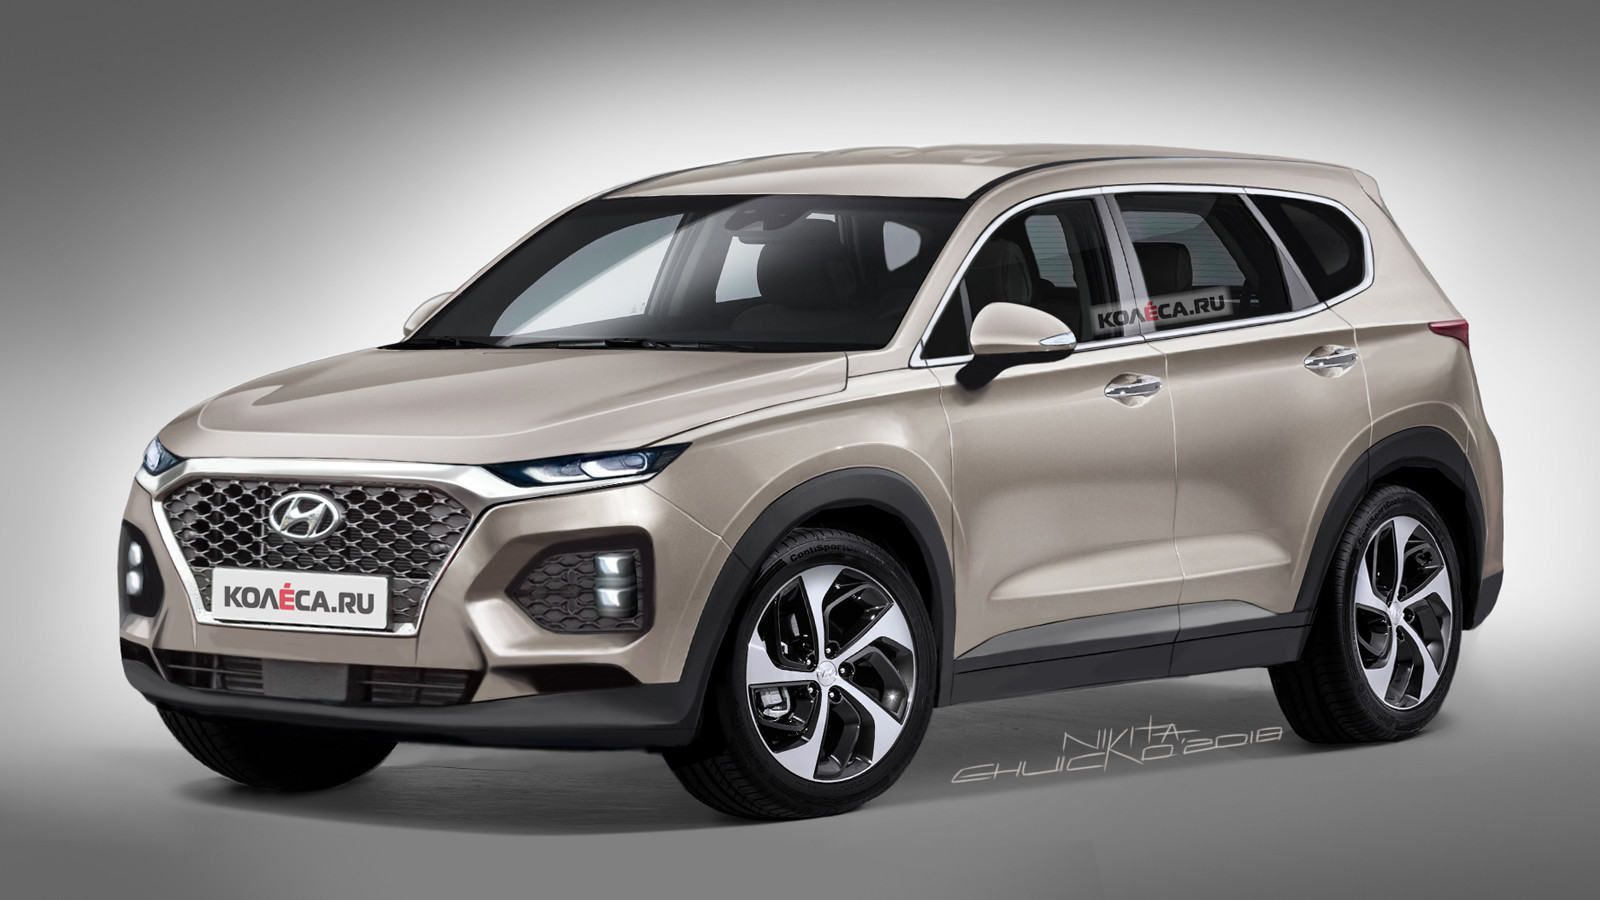 http://www.kolesa.ru/uploads/2018/02/Hyundai-Santa-Fe-front2-1600x0-c-default.jpg